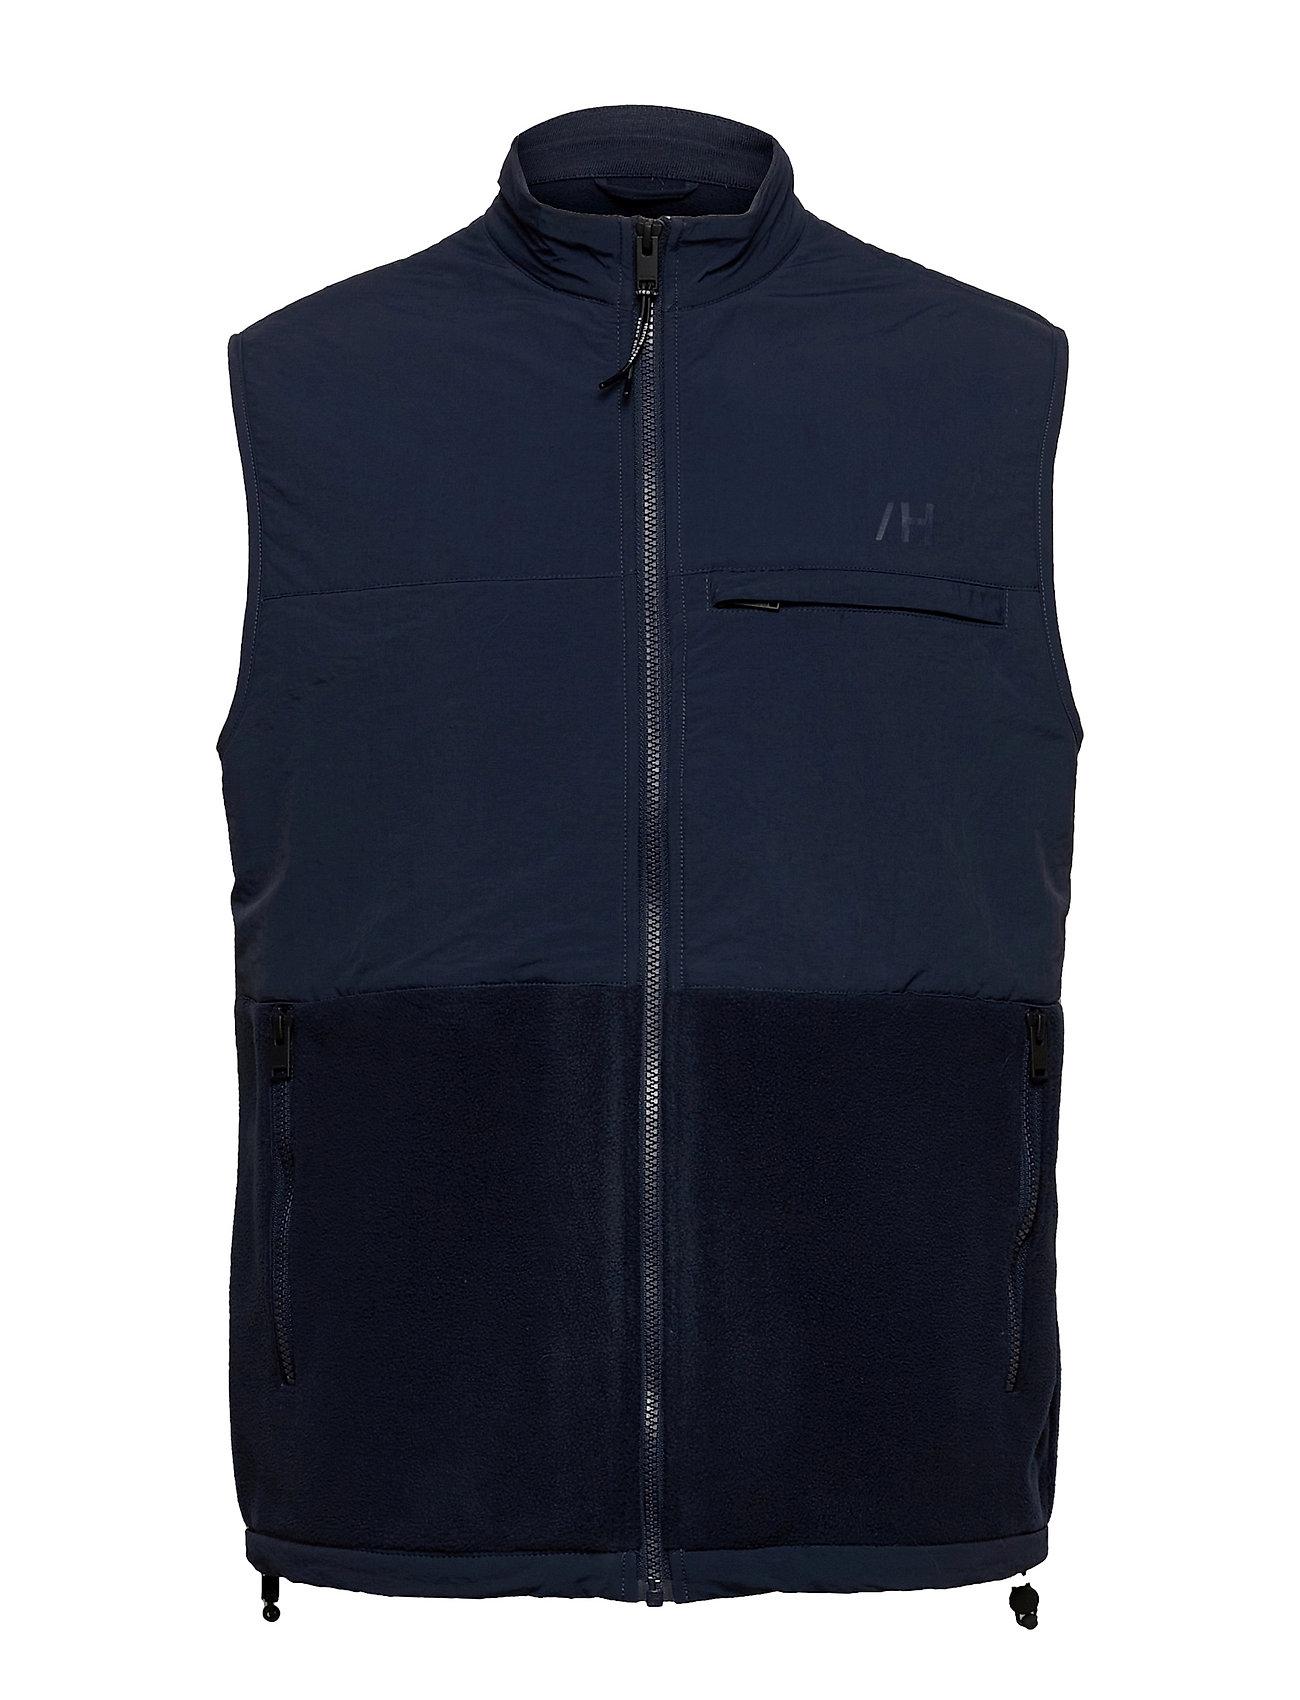 Slhnohr Fleece Vest W Vest Sort Selected Homme